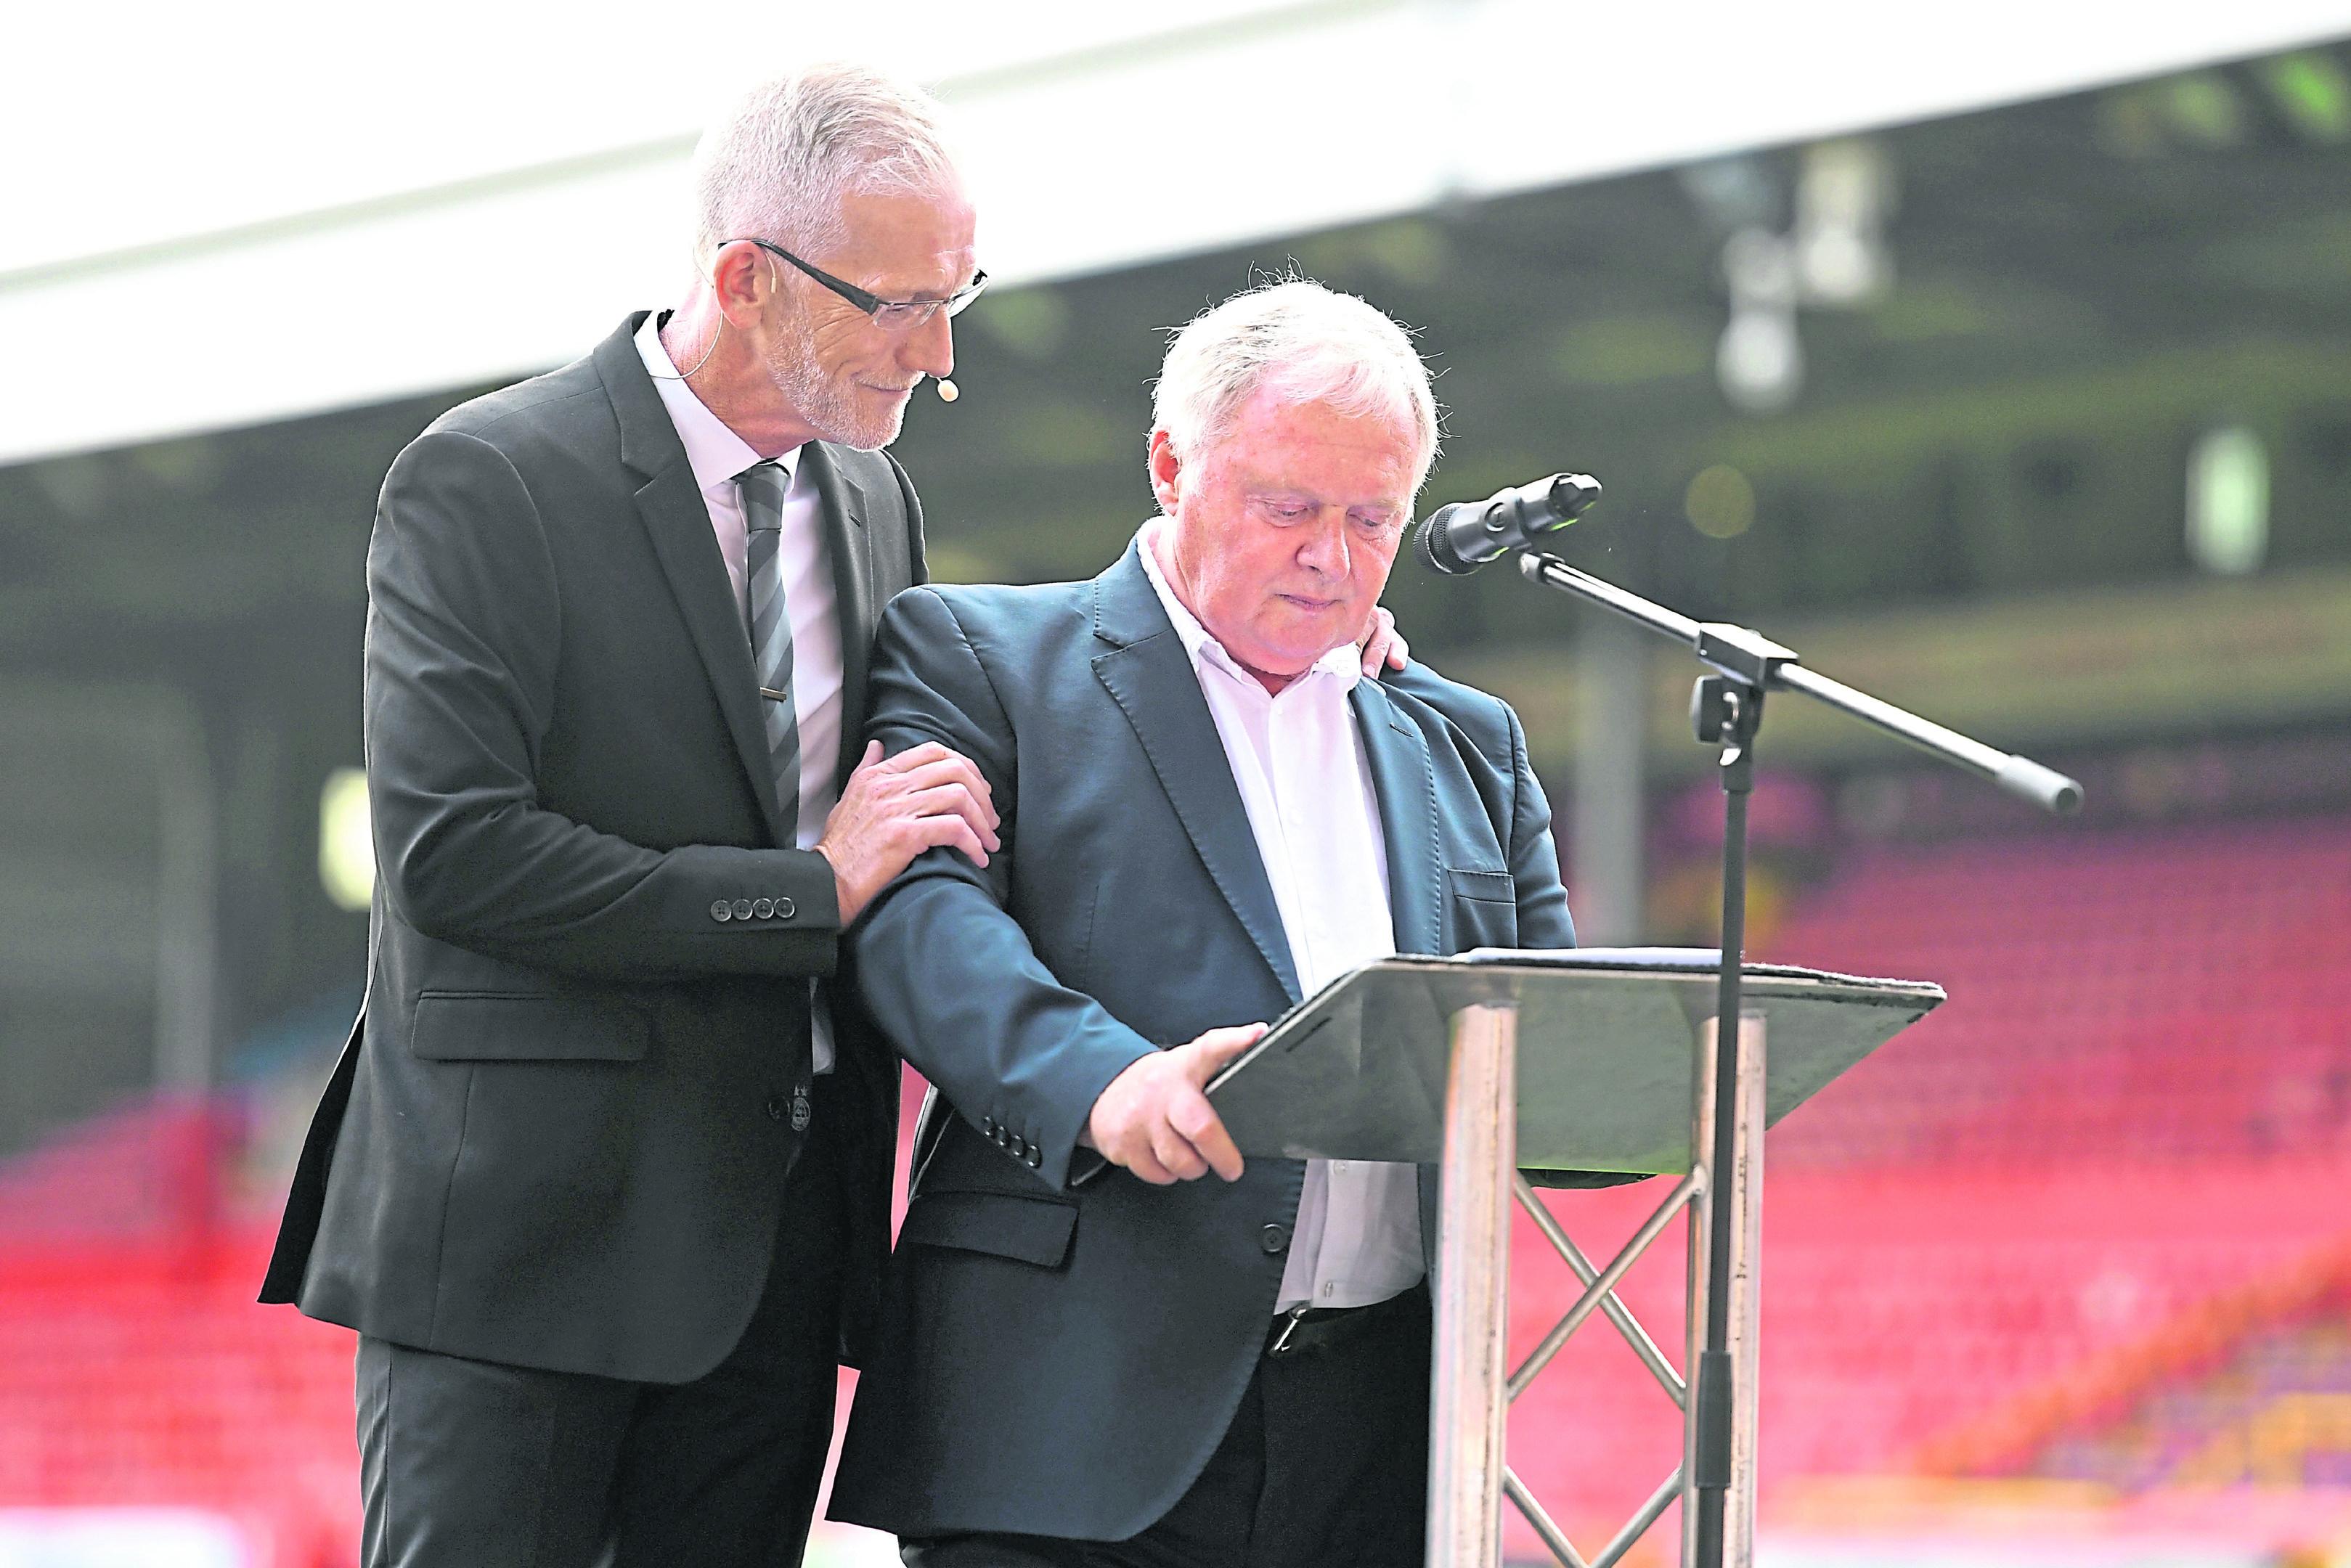 Joe Harper is comforted by host Richard Gordon as he addresses the crowd.